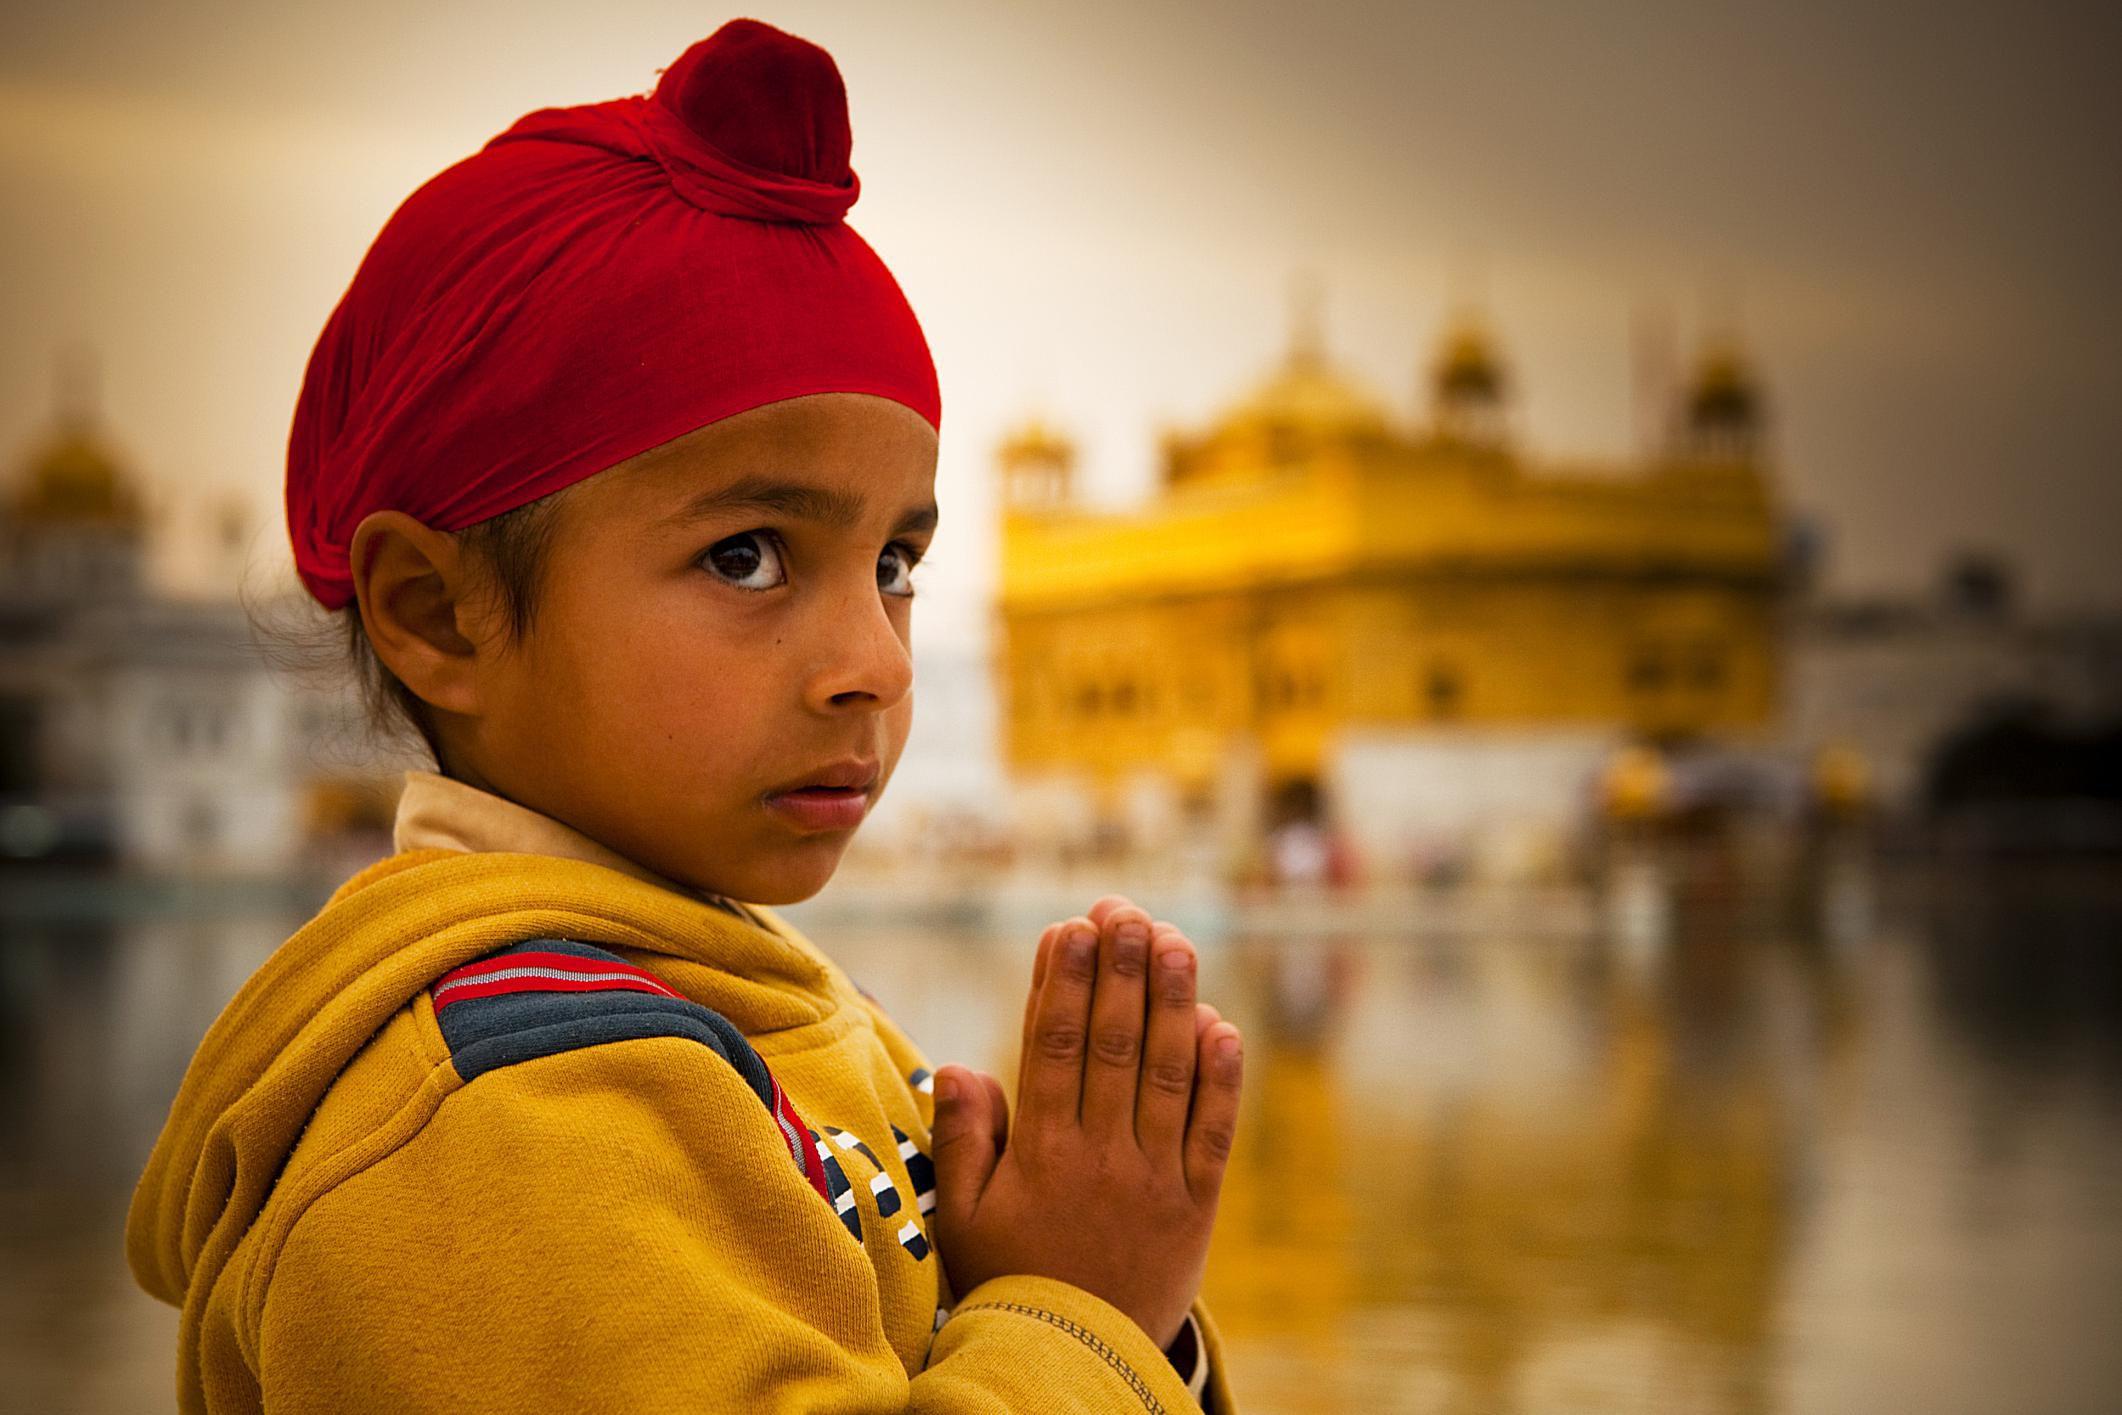 Do Sikhs Believe in Prayer? - Meditation in Sikhism